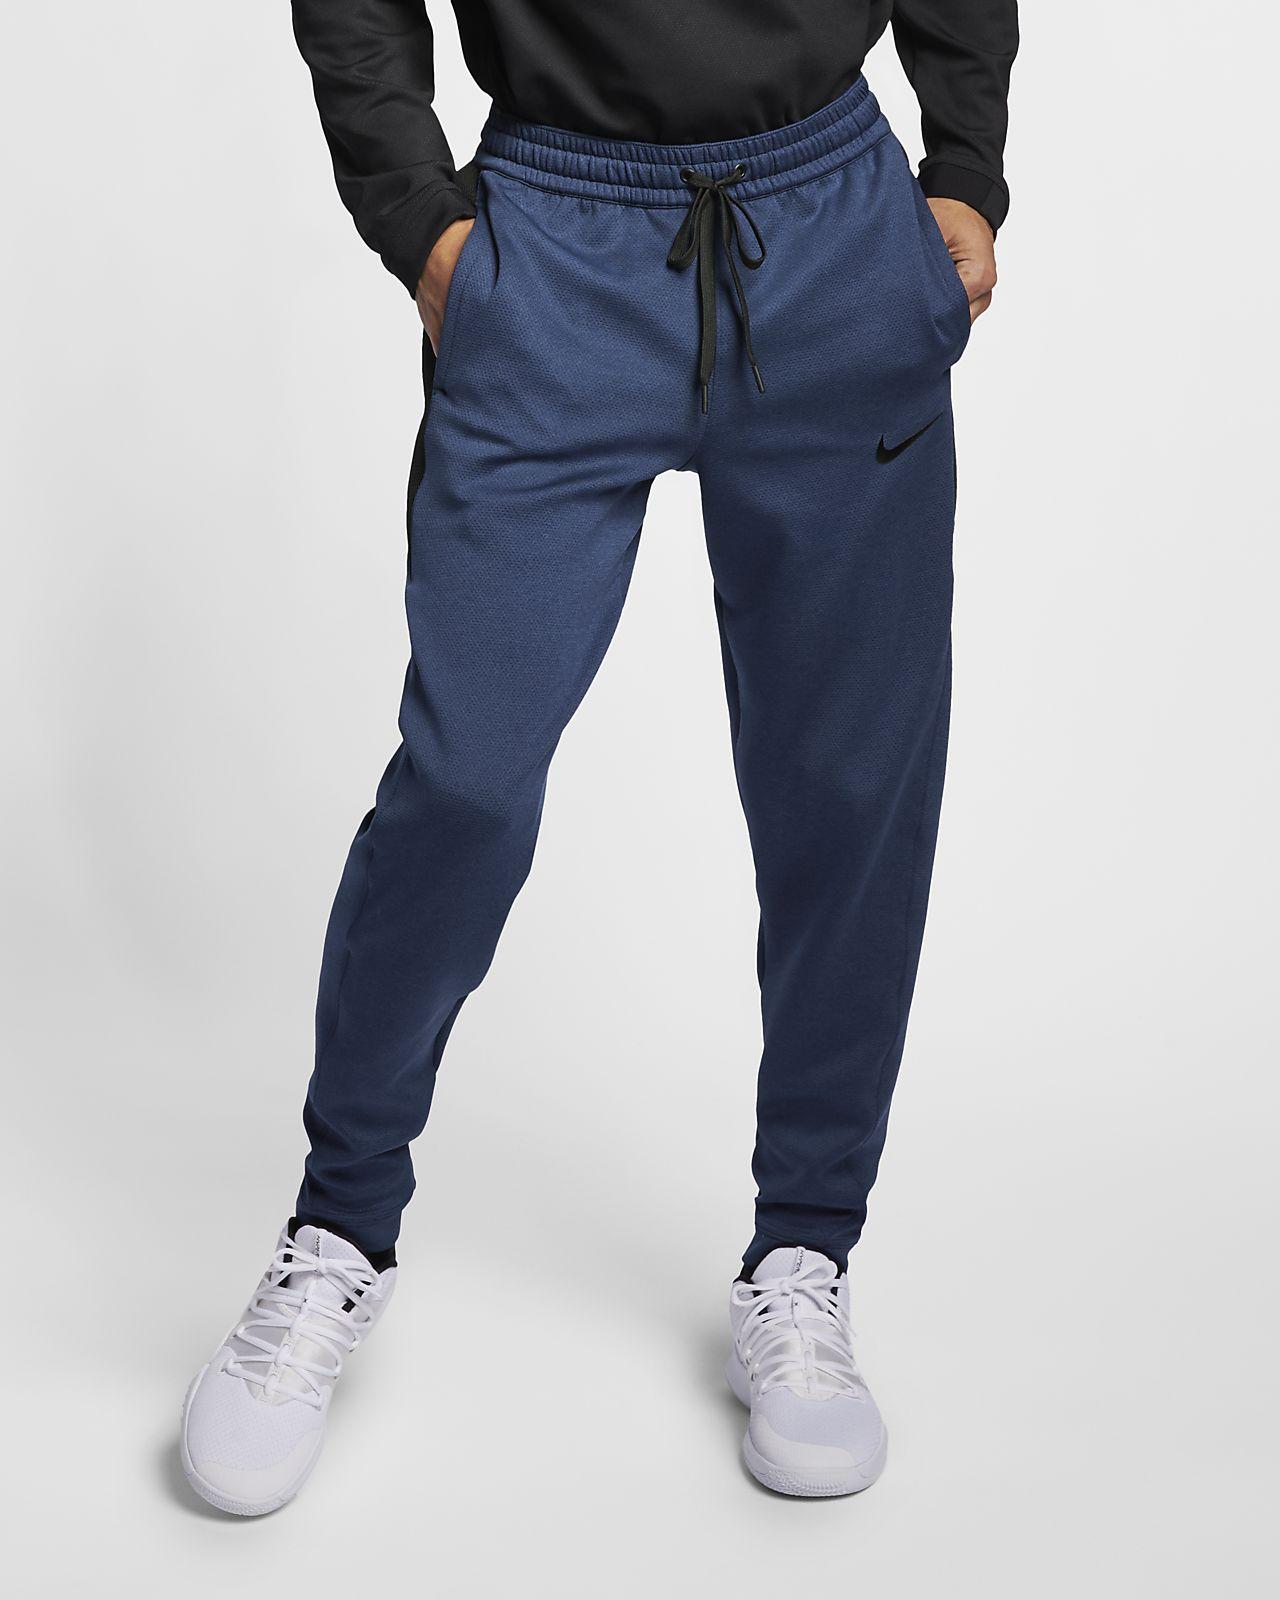 857095b5e2f6f Pantalones de básquetbol para hombre Nike Therma Flex Showtime. Nike ...